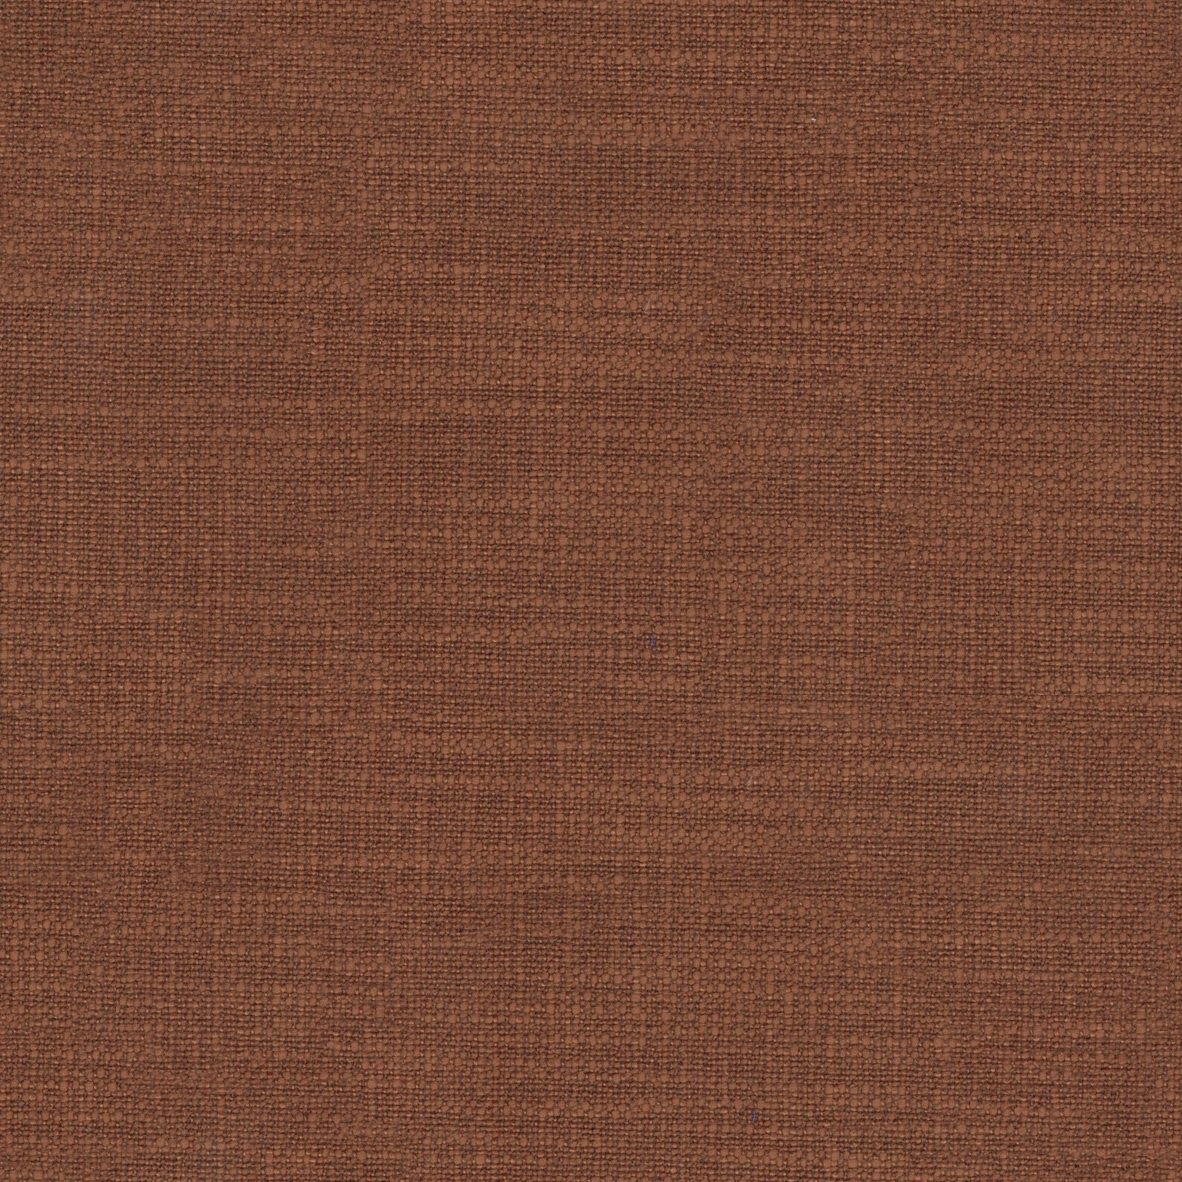 Best Pin By Mostafa Mahmoud On Textile Digital Sofa Texture 400 x 300